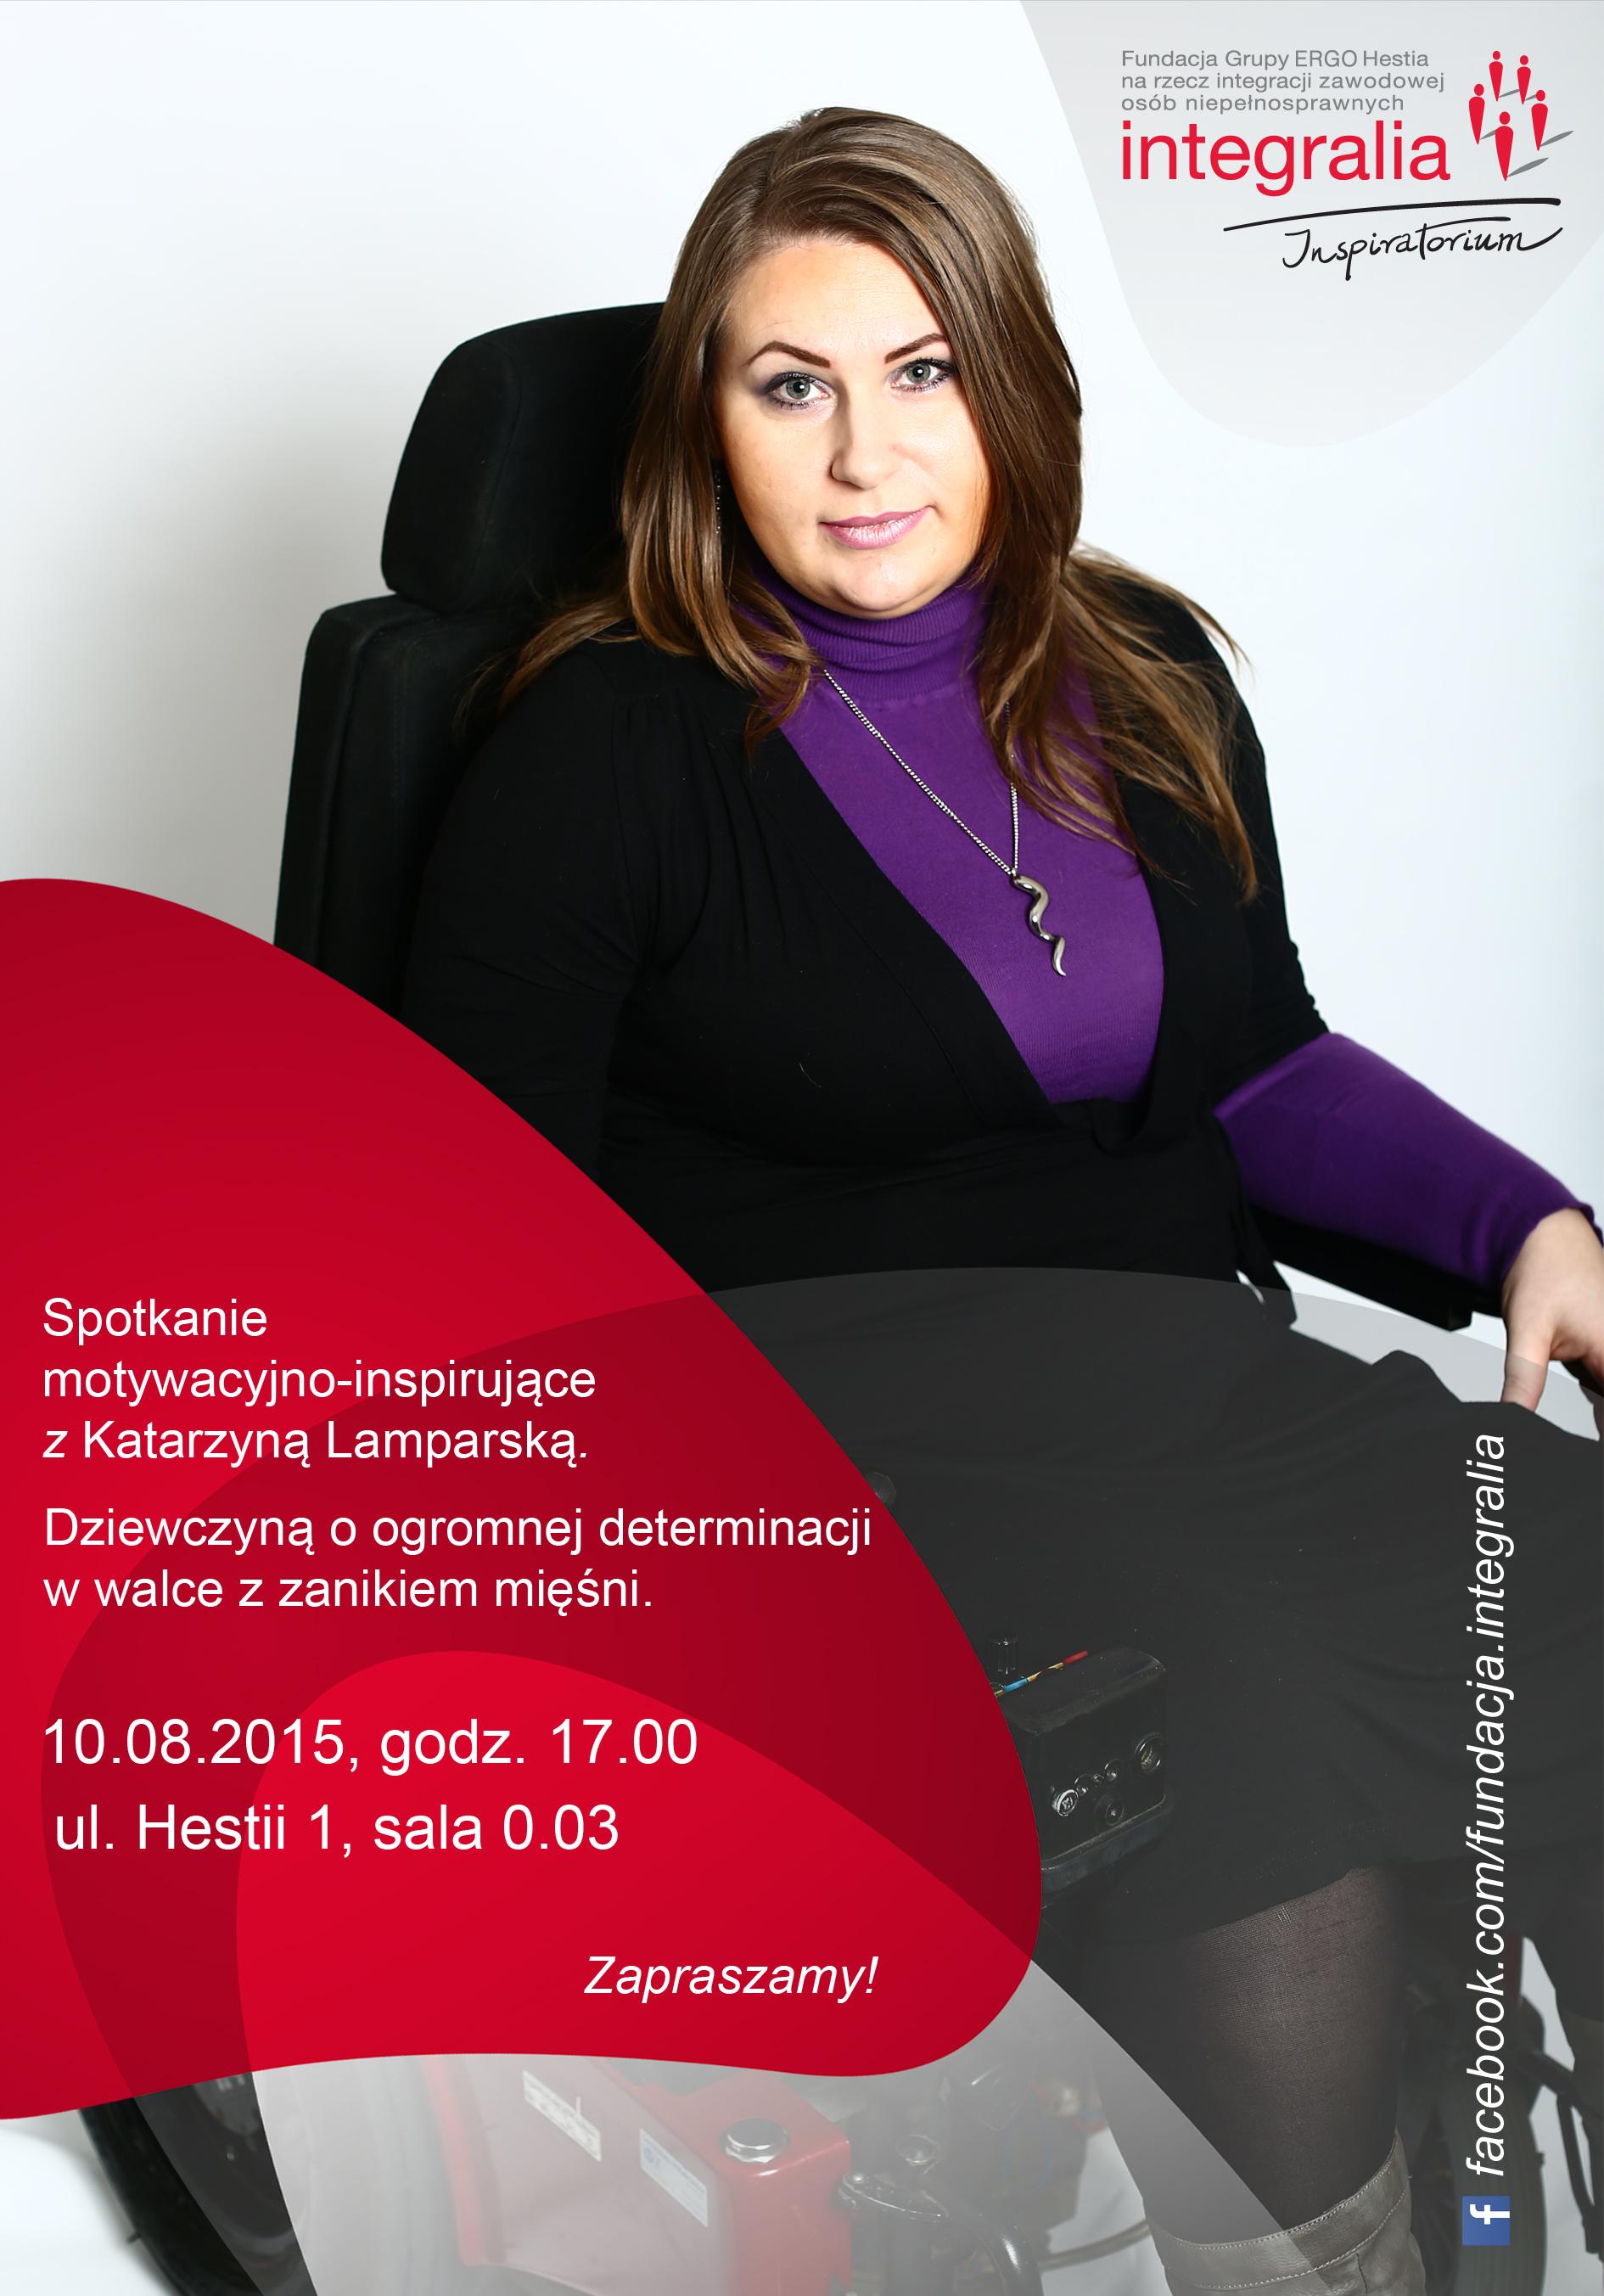 Integralia_spotkanie_plakat_sierpień_2015.jpg